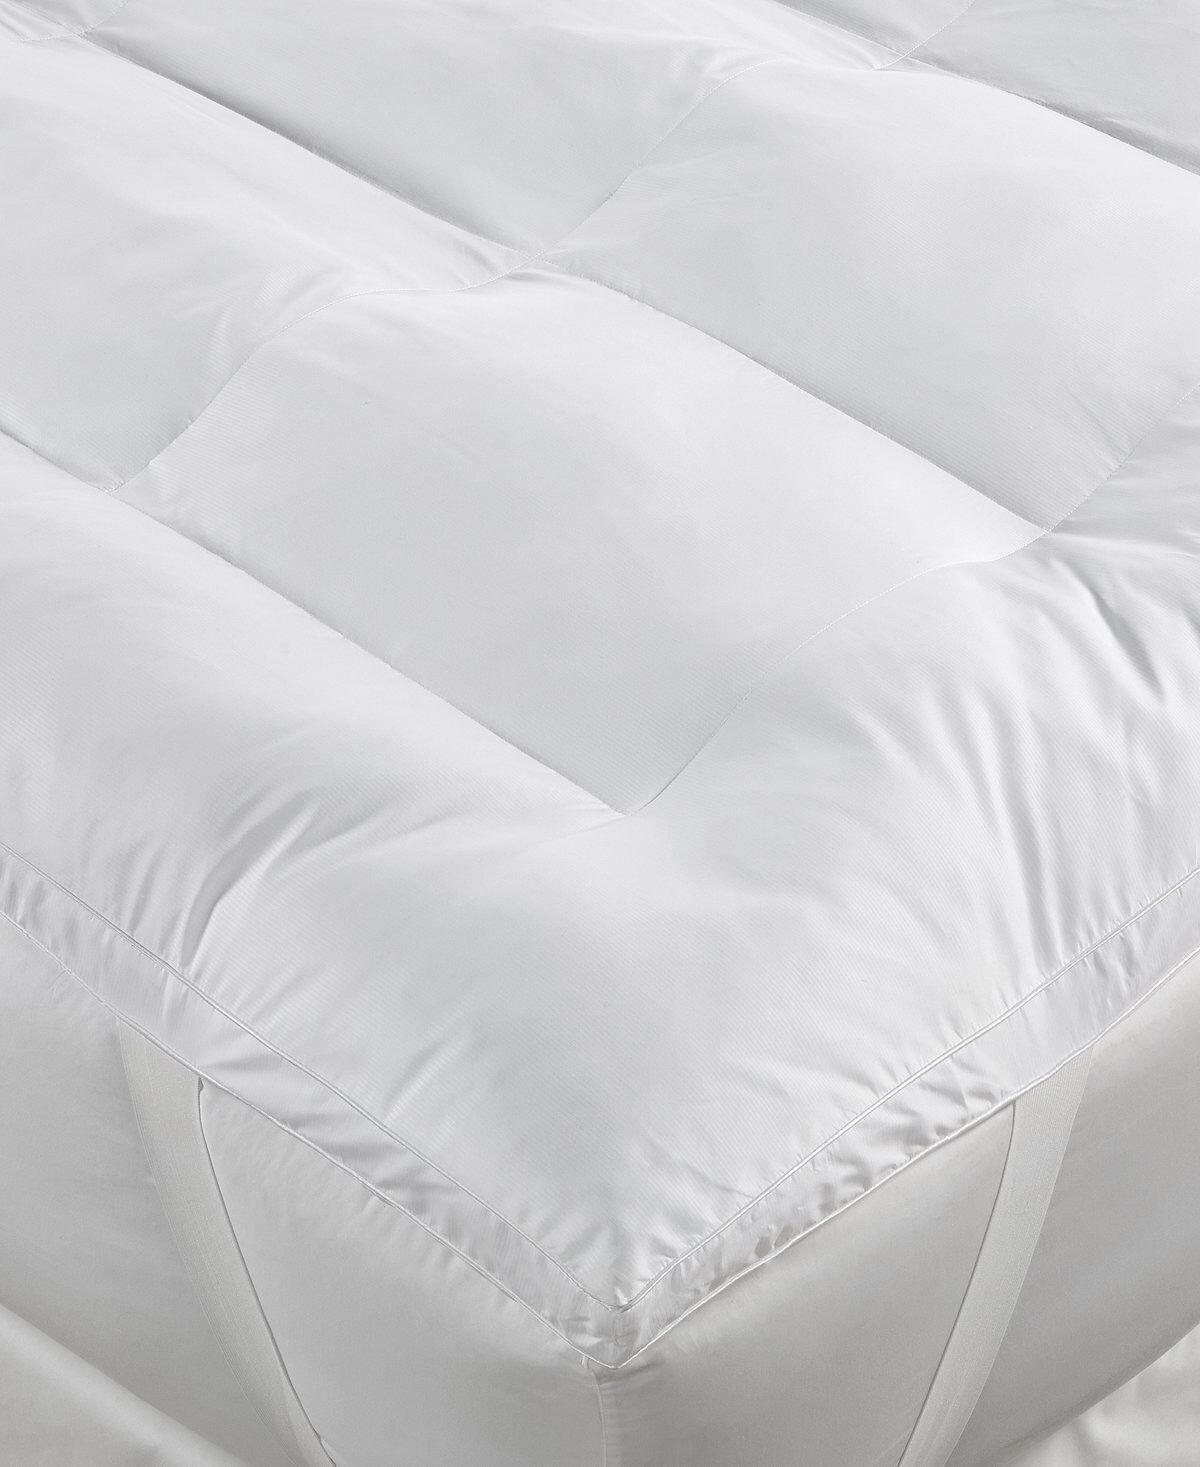 Martha Stewart Dream Science Gel Enhanced Memory Foam QUEEN Fiberbed D5555